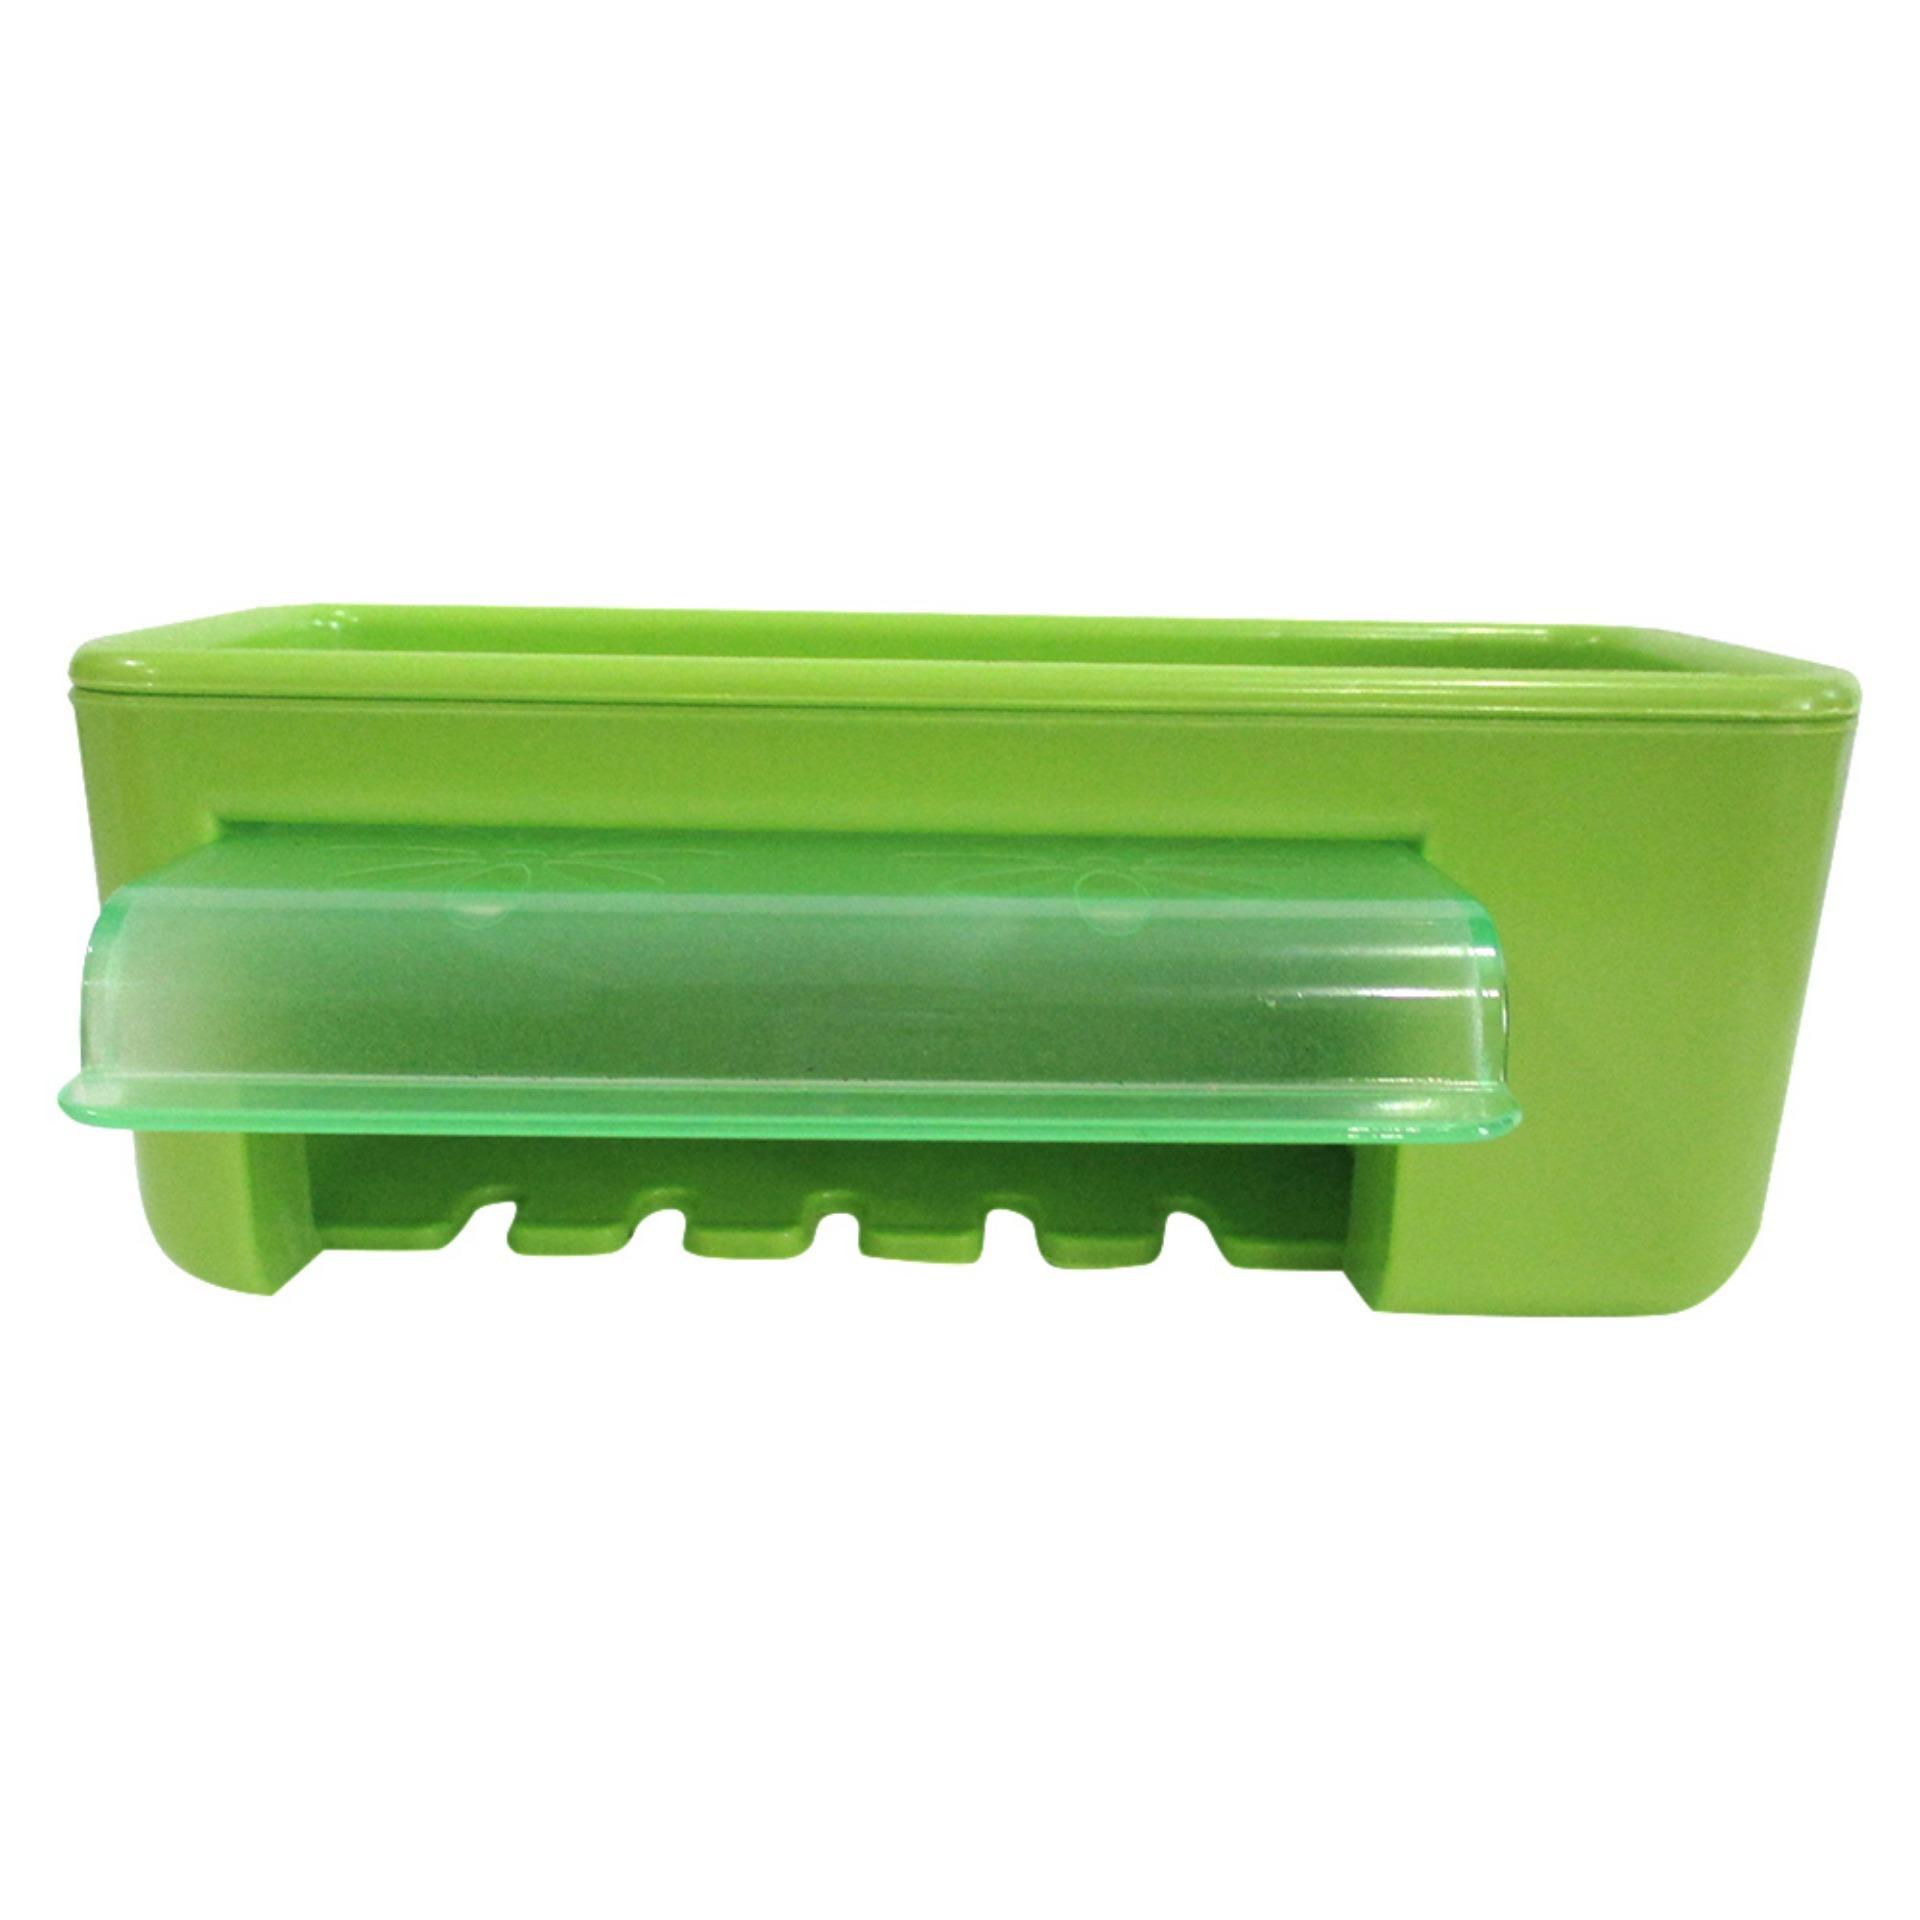 Maspion Tempat Sabun Dan Sikat Gigi / Maspion product / SNI / Tempat Sabun / Perlengkapan Mandi / Sabun Dan Shampoo / Kebersihan